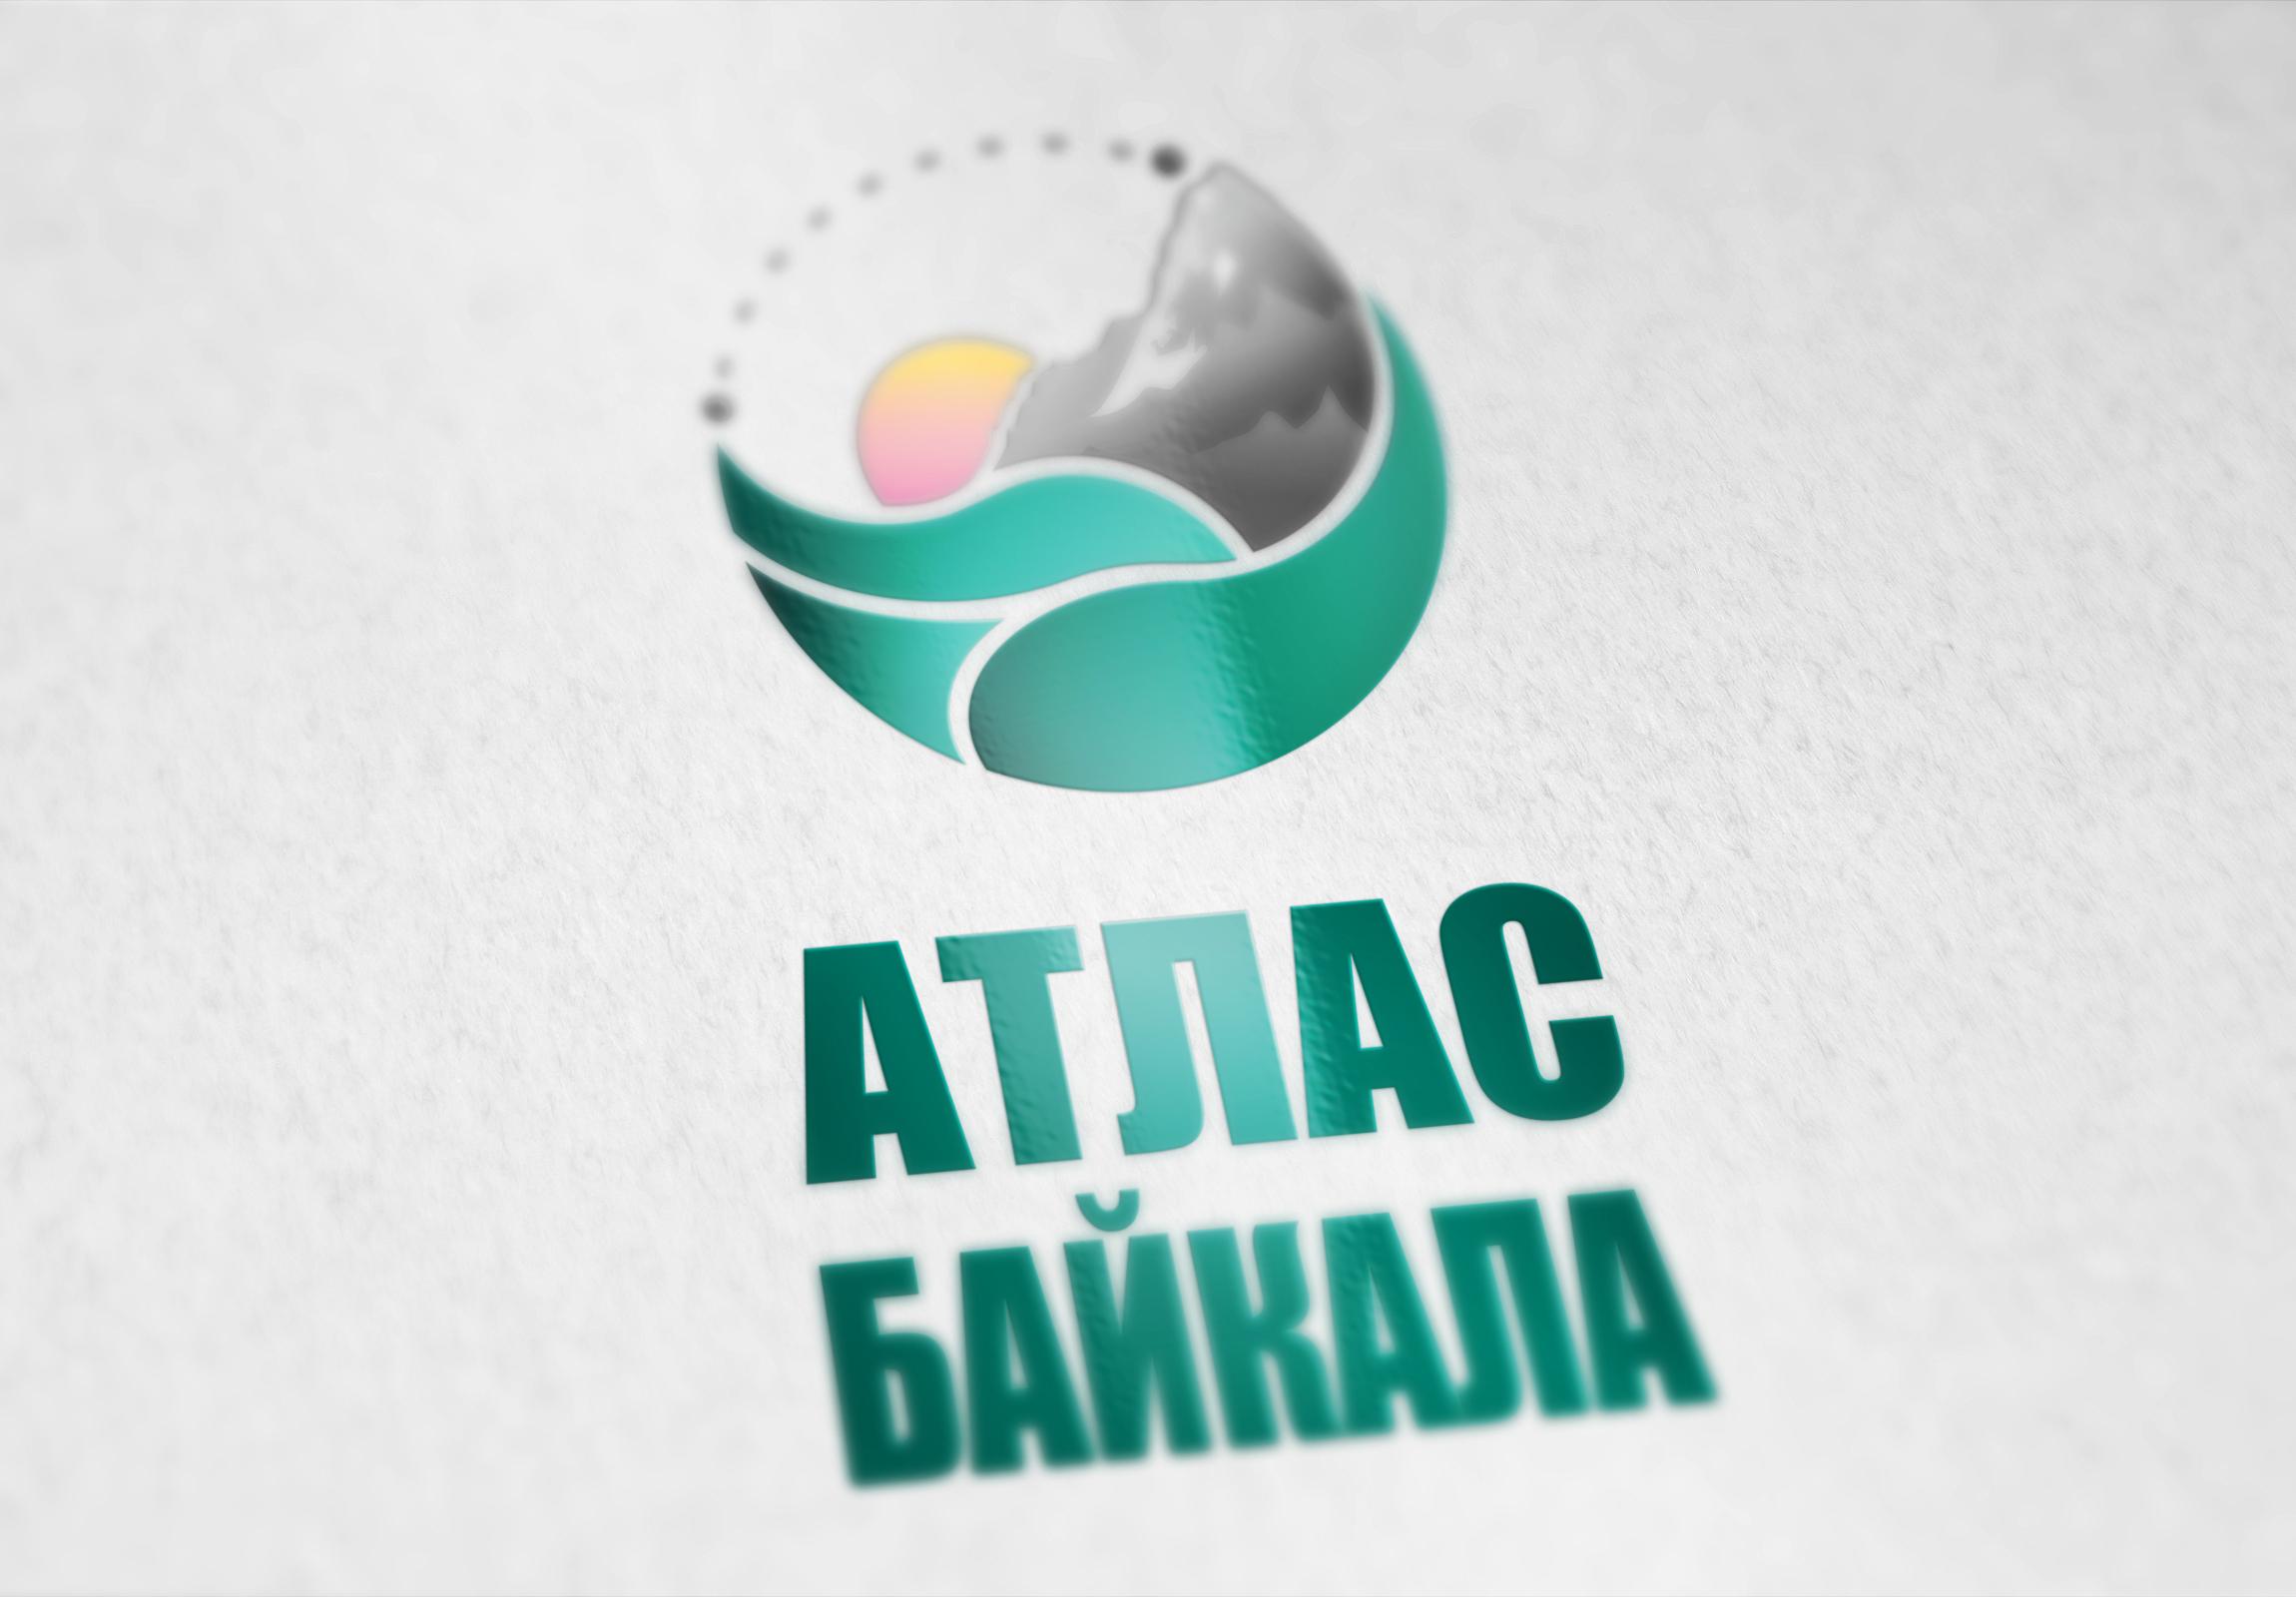 Разработка логотипа Атлас Байкала фото f_7115b1aab36df595.jpg